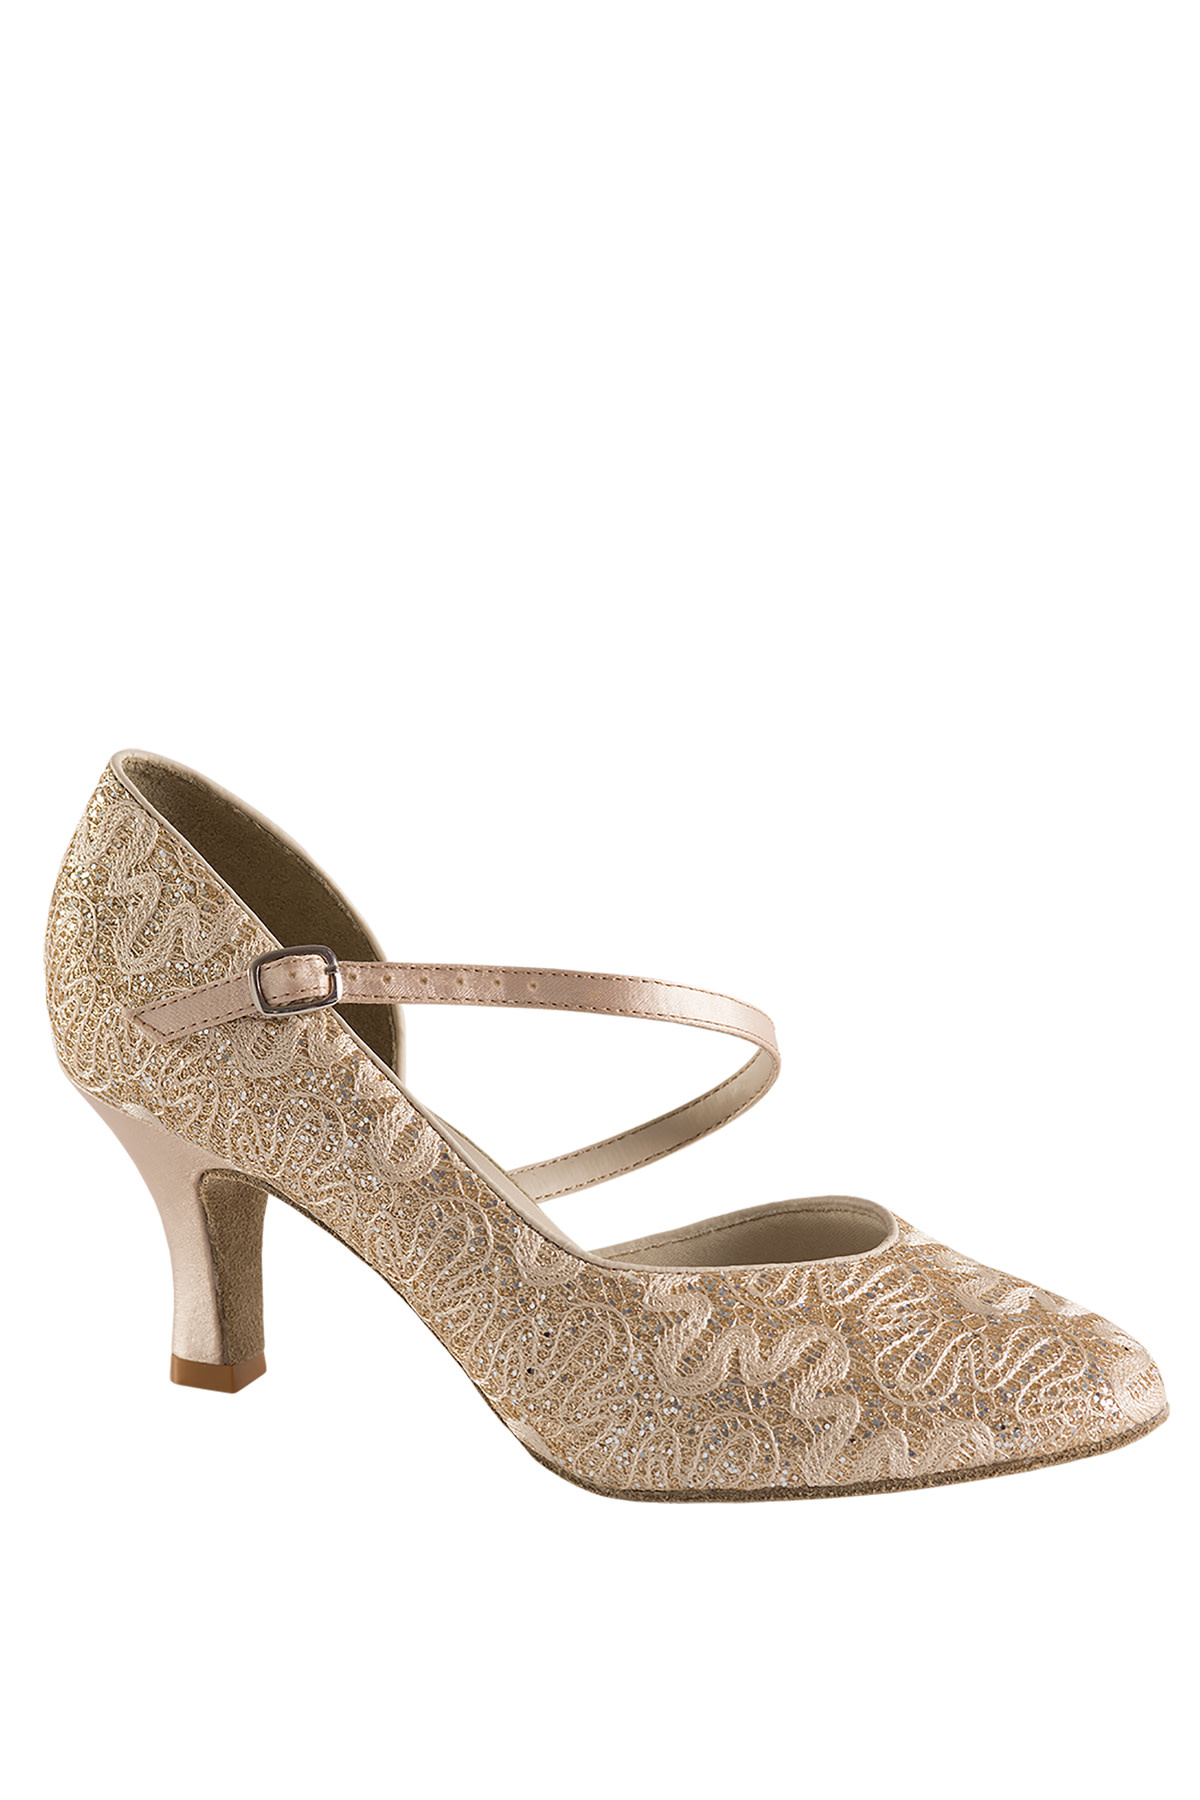 "So Danca Ballroom Dance Shoes So Danca BL-504, 2.5"" Heel, Close Toe"